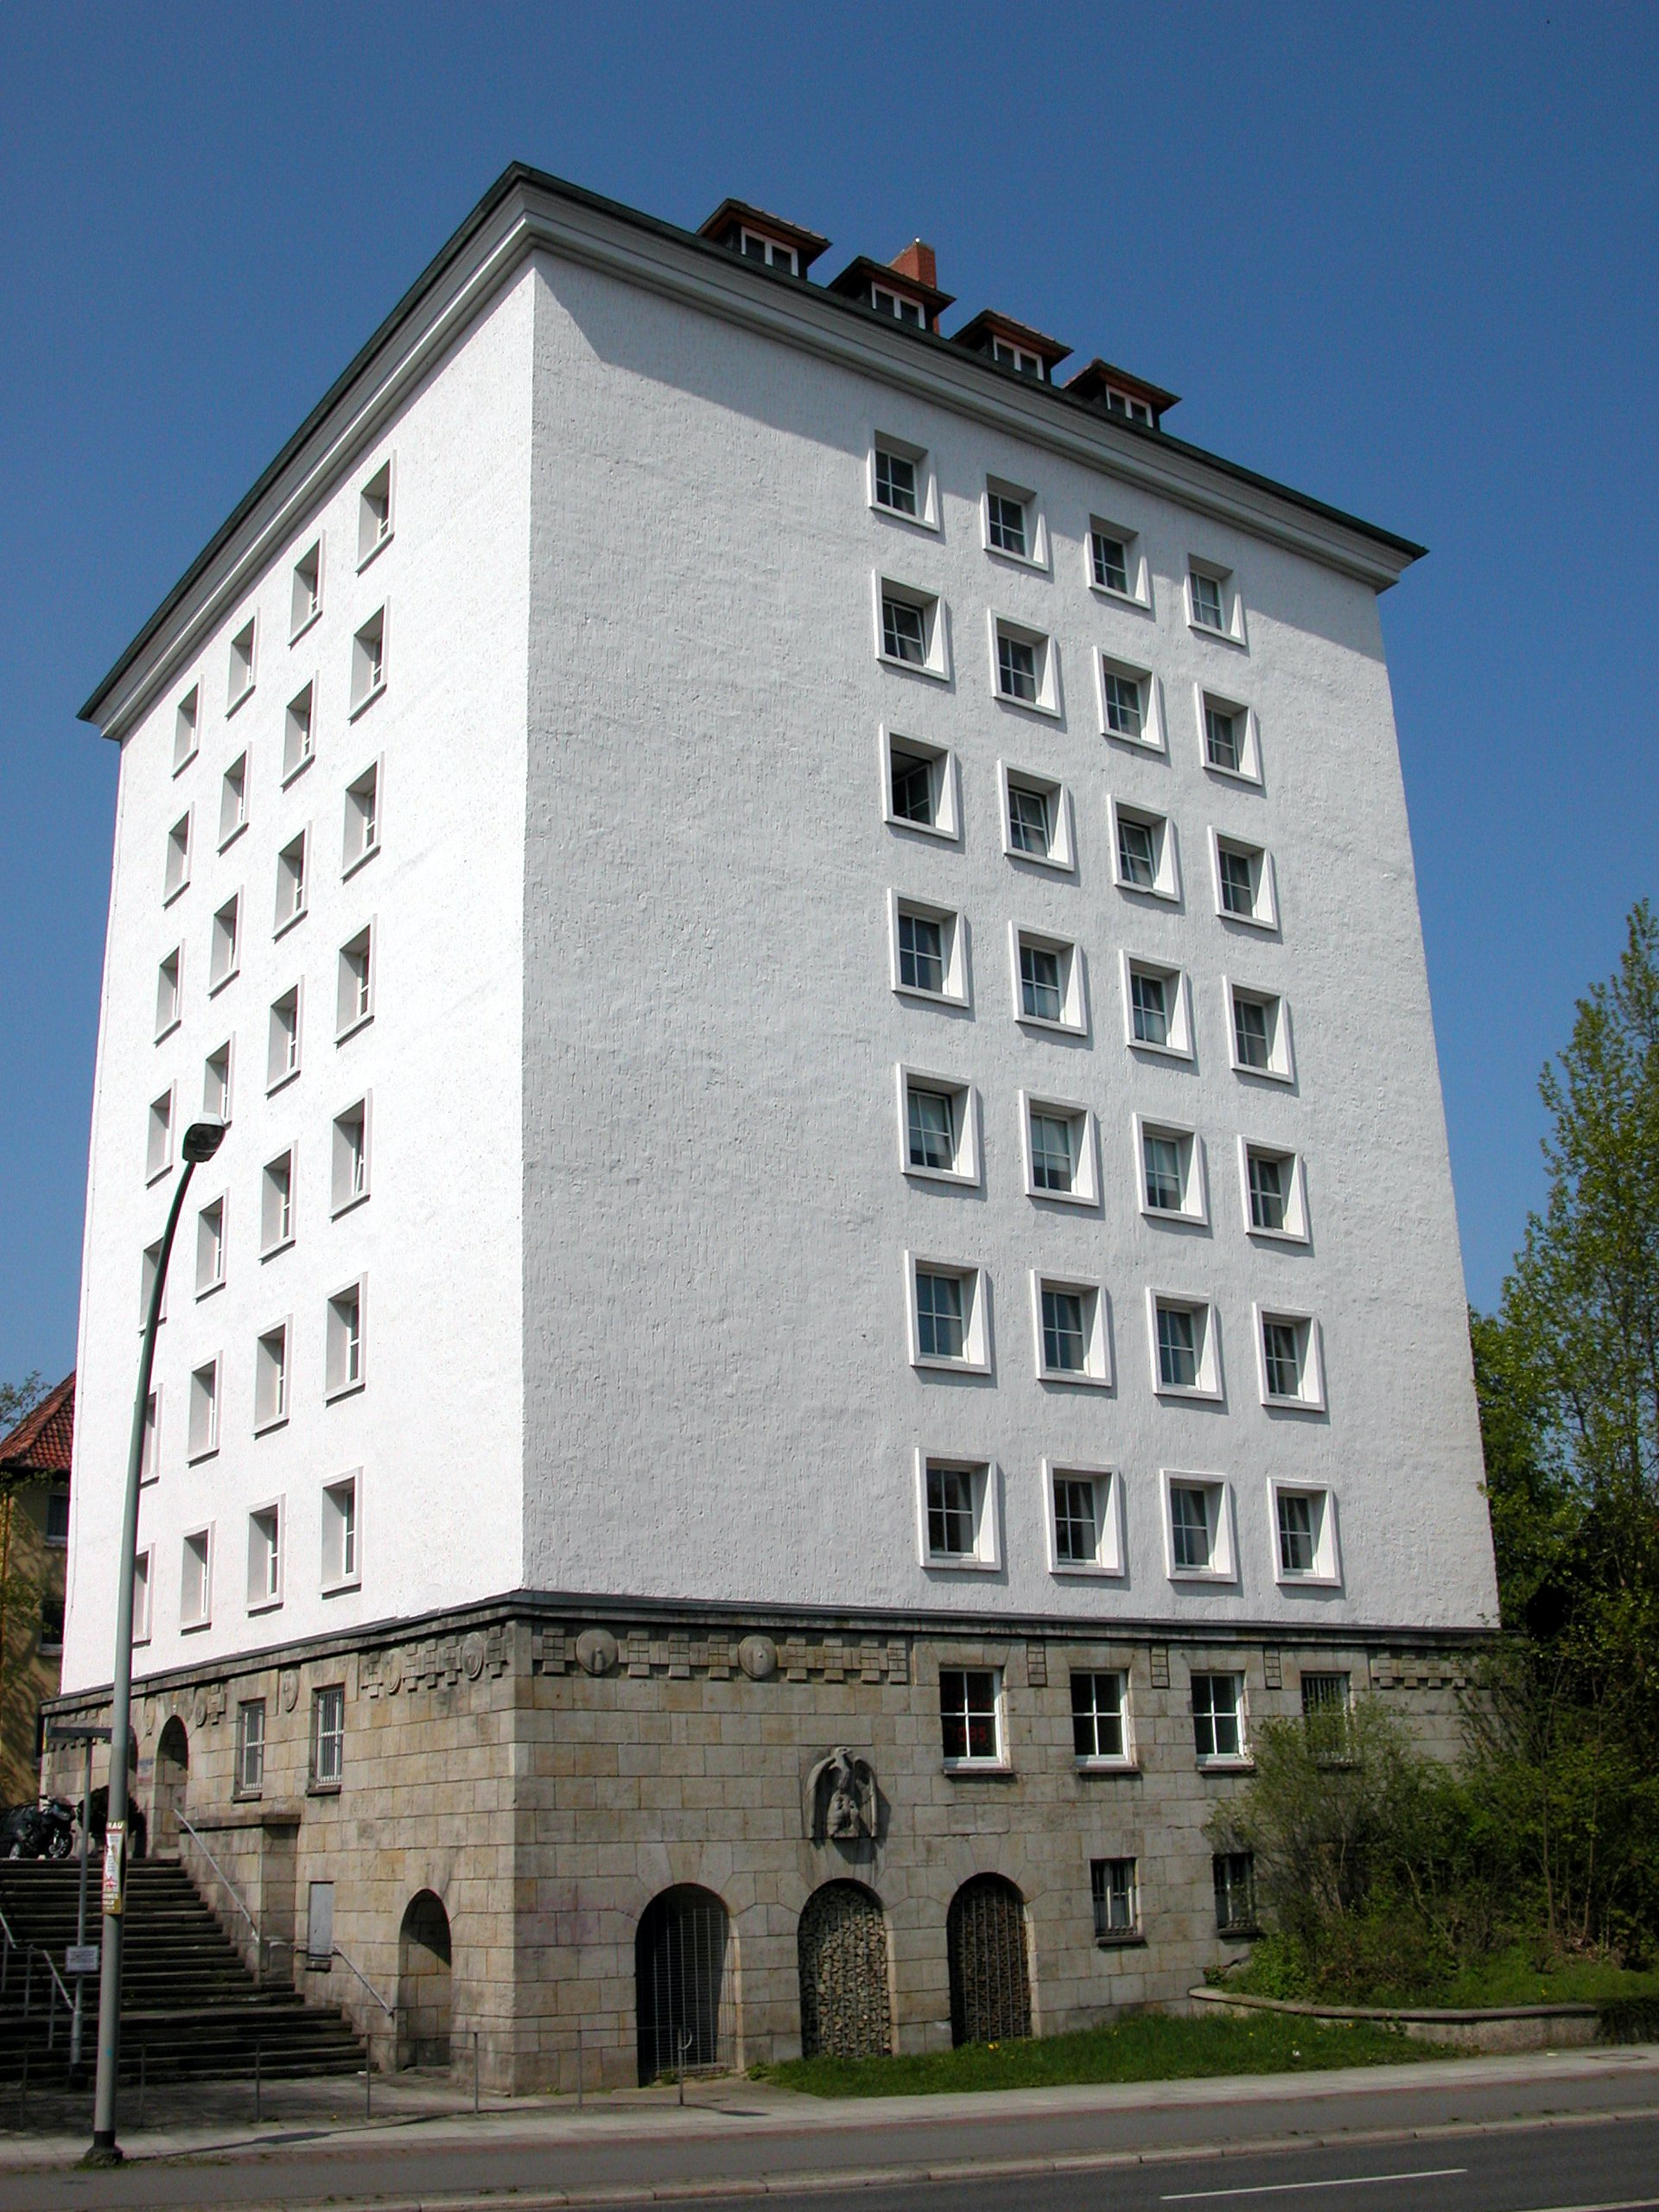 Baufirmen Braunschweig baufirmen braunschweig hausdesign pro